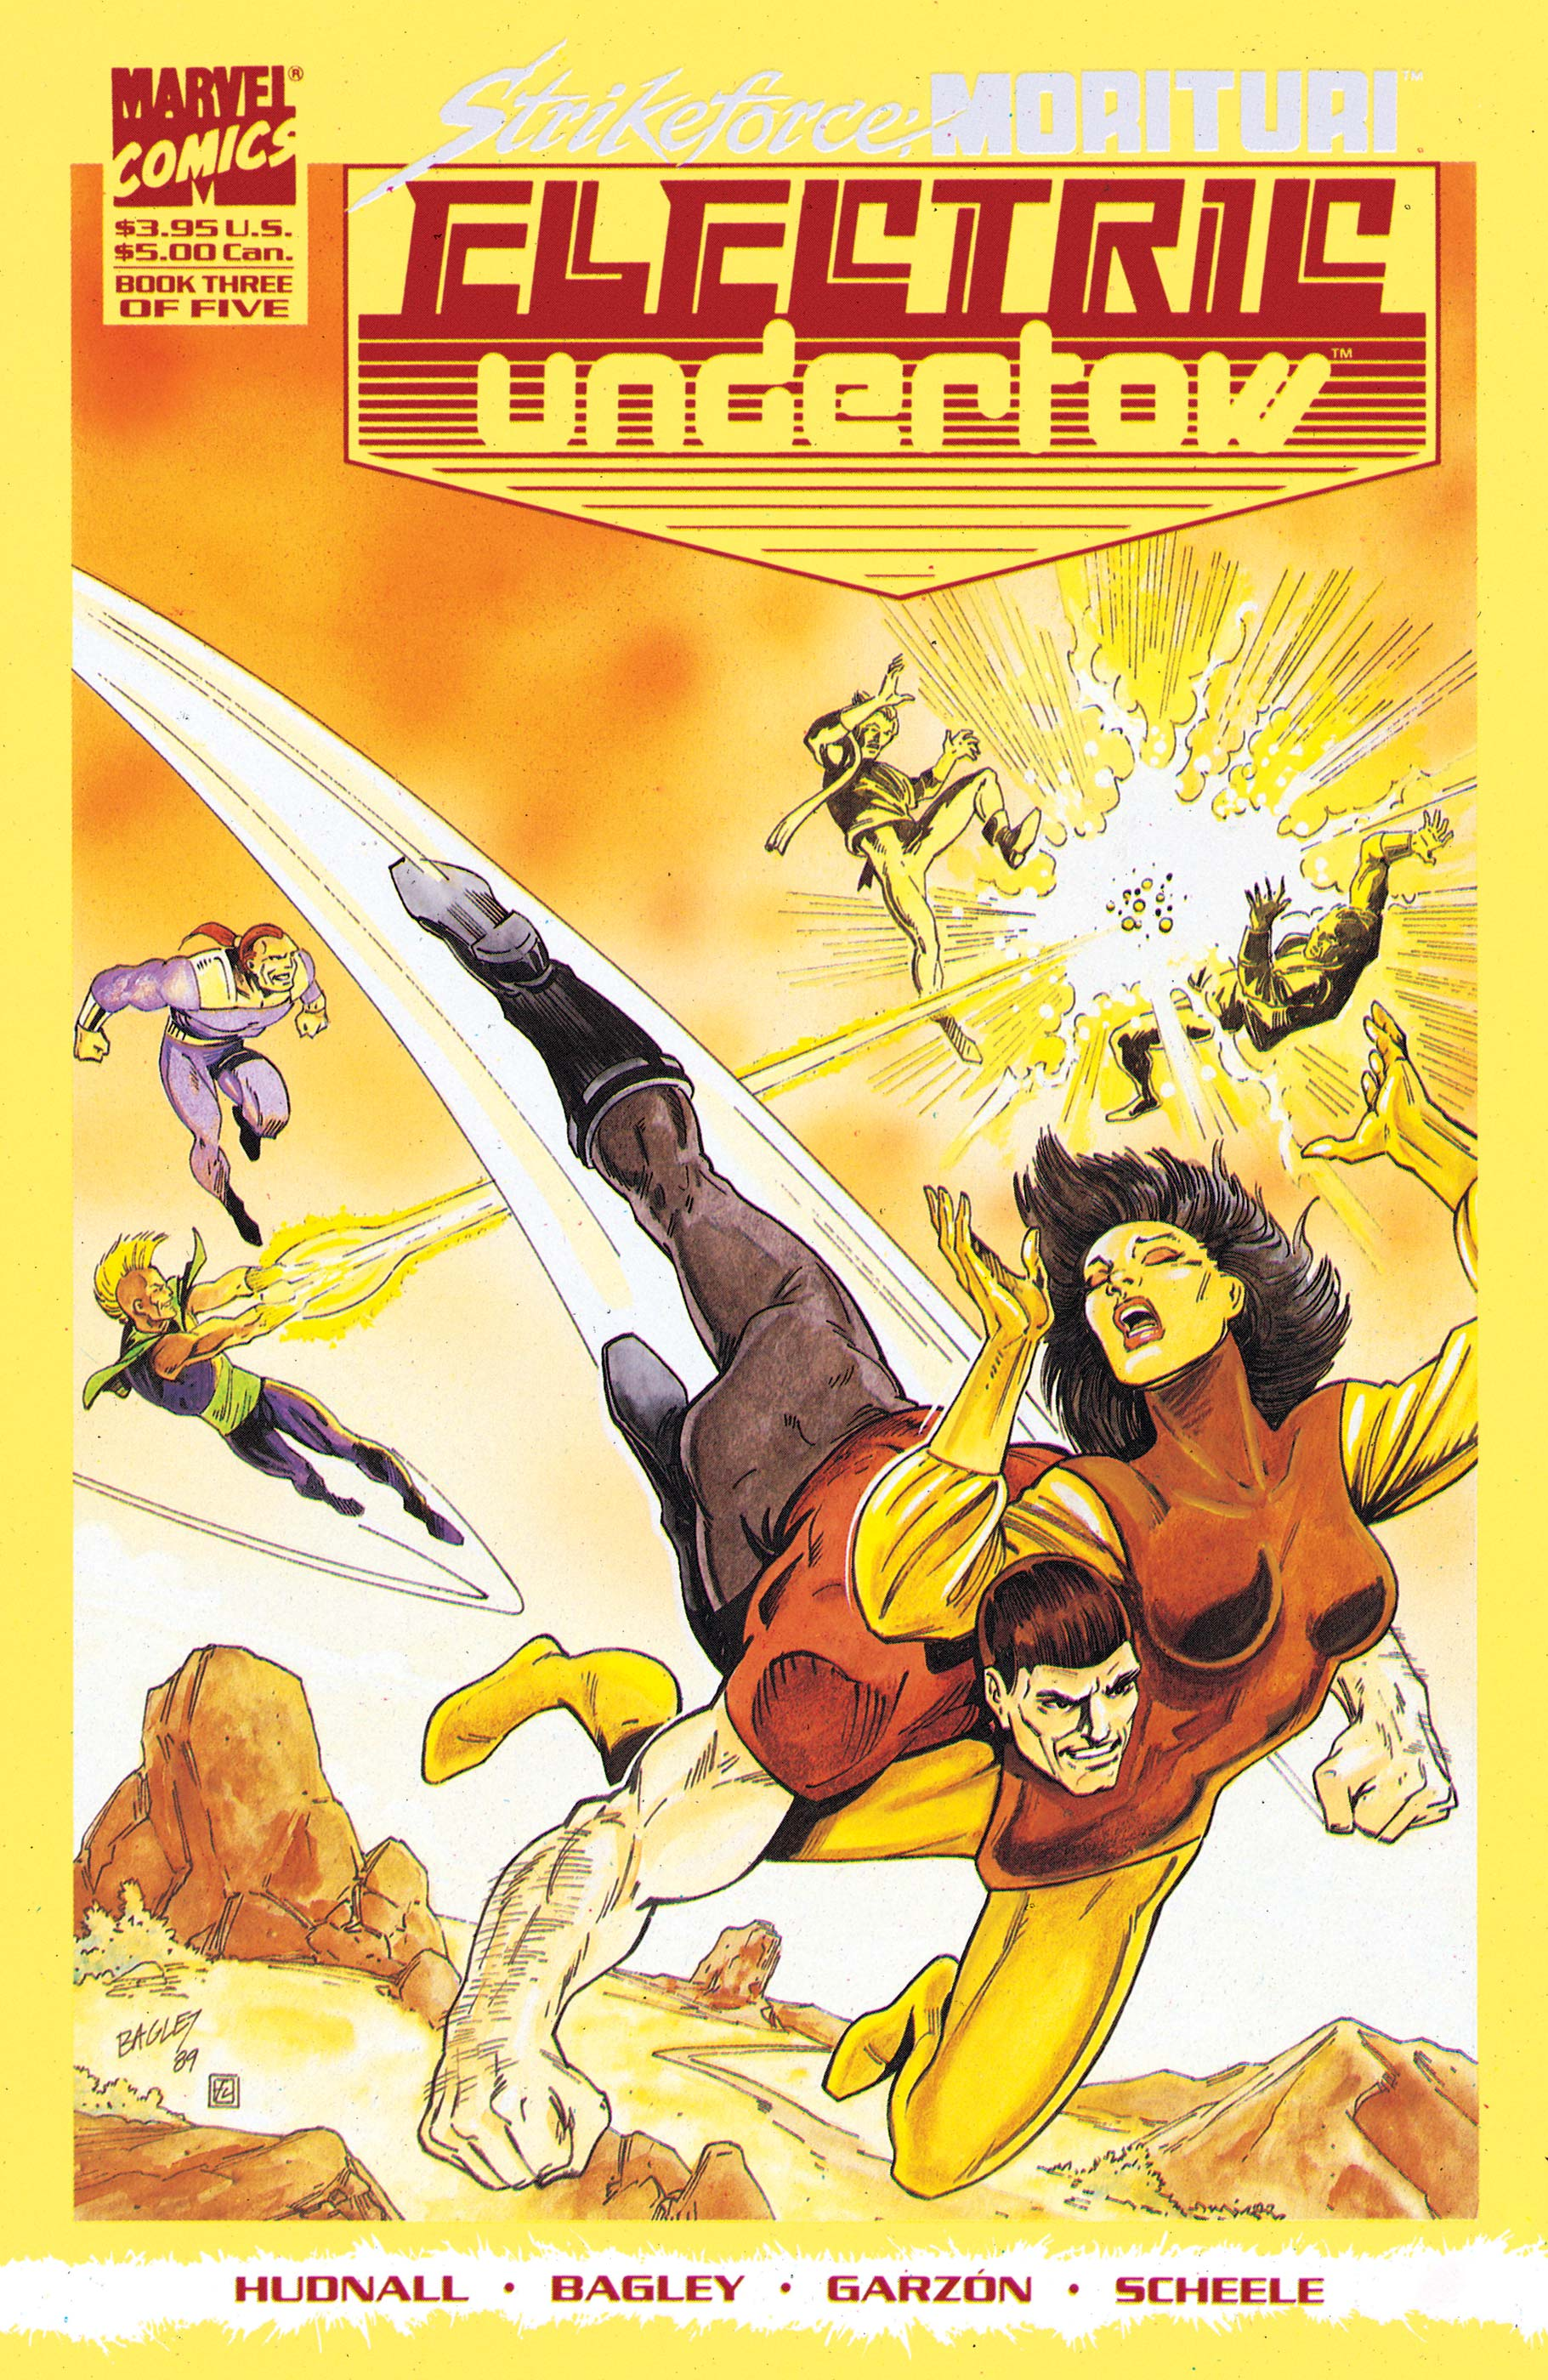 Strikeforce Morituri: Electric Undertow (1989) #3